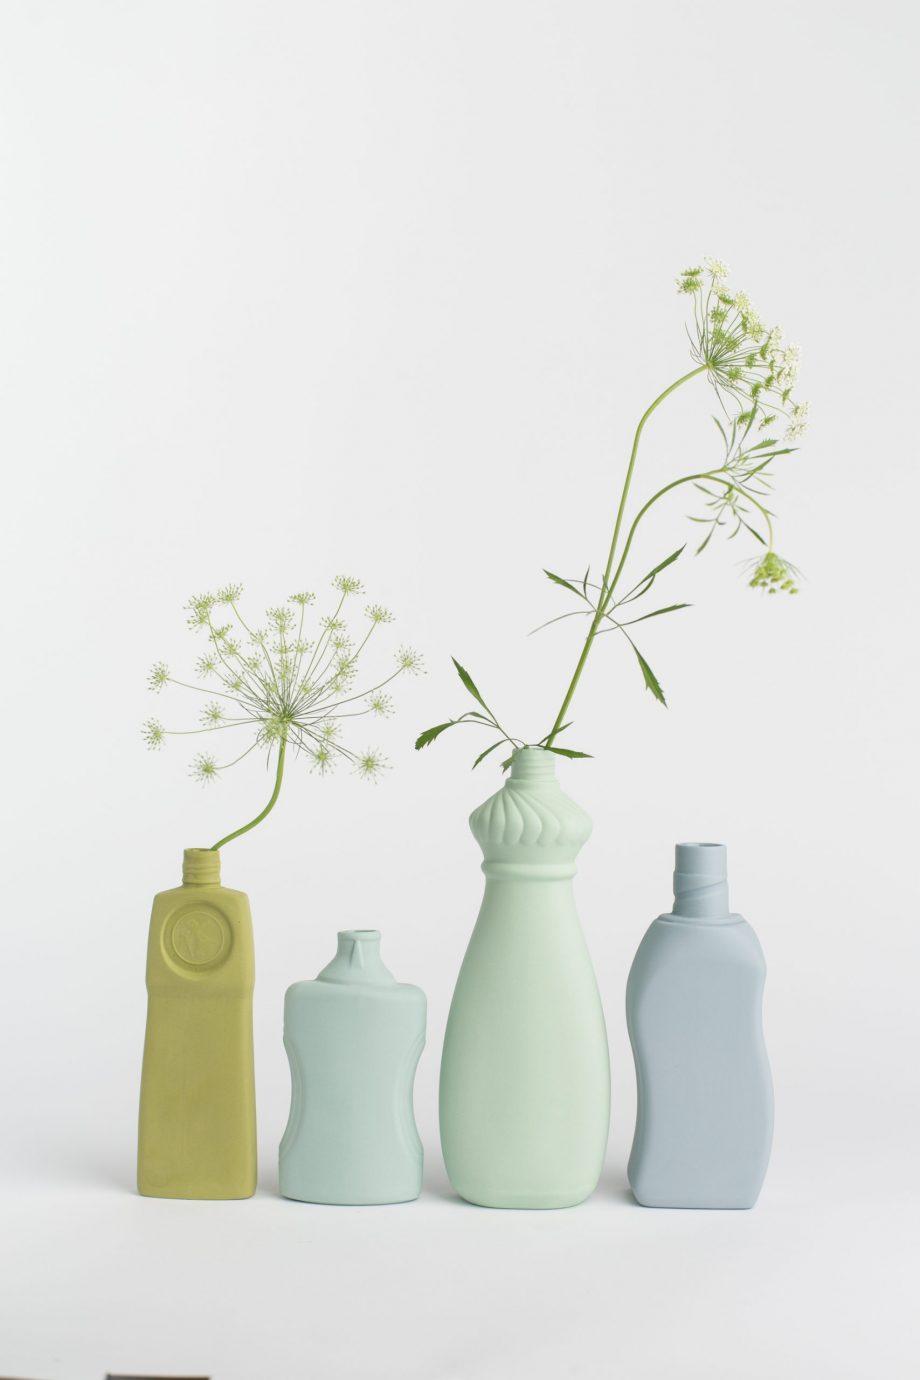 group photo porcelain vases